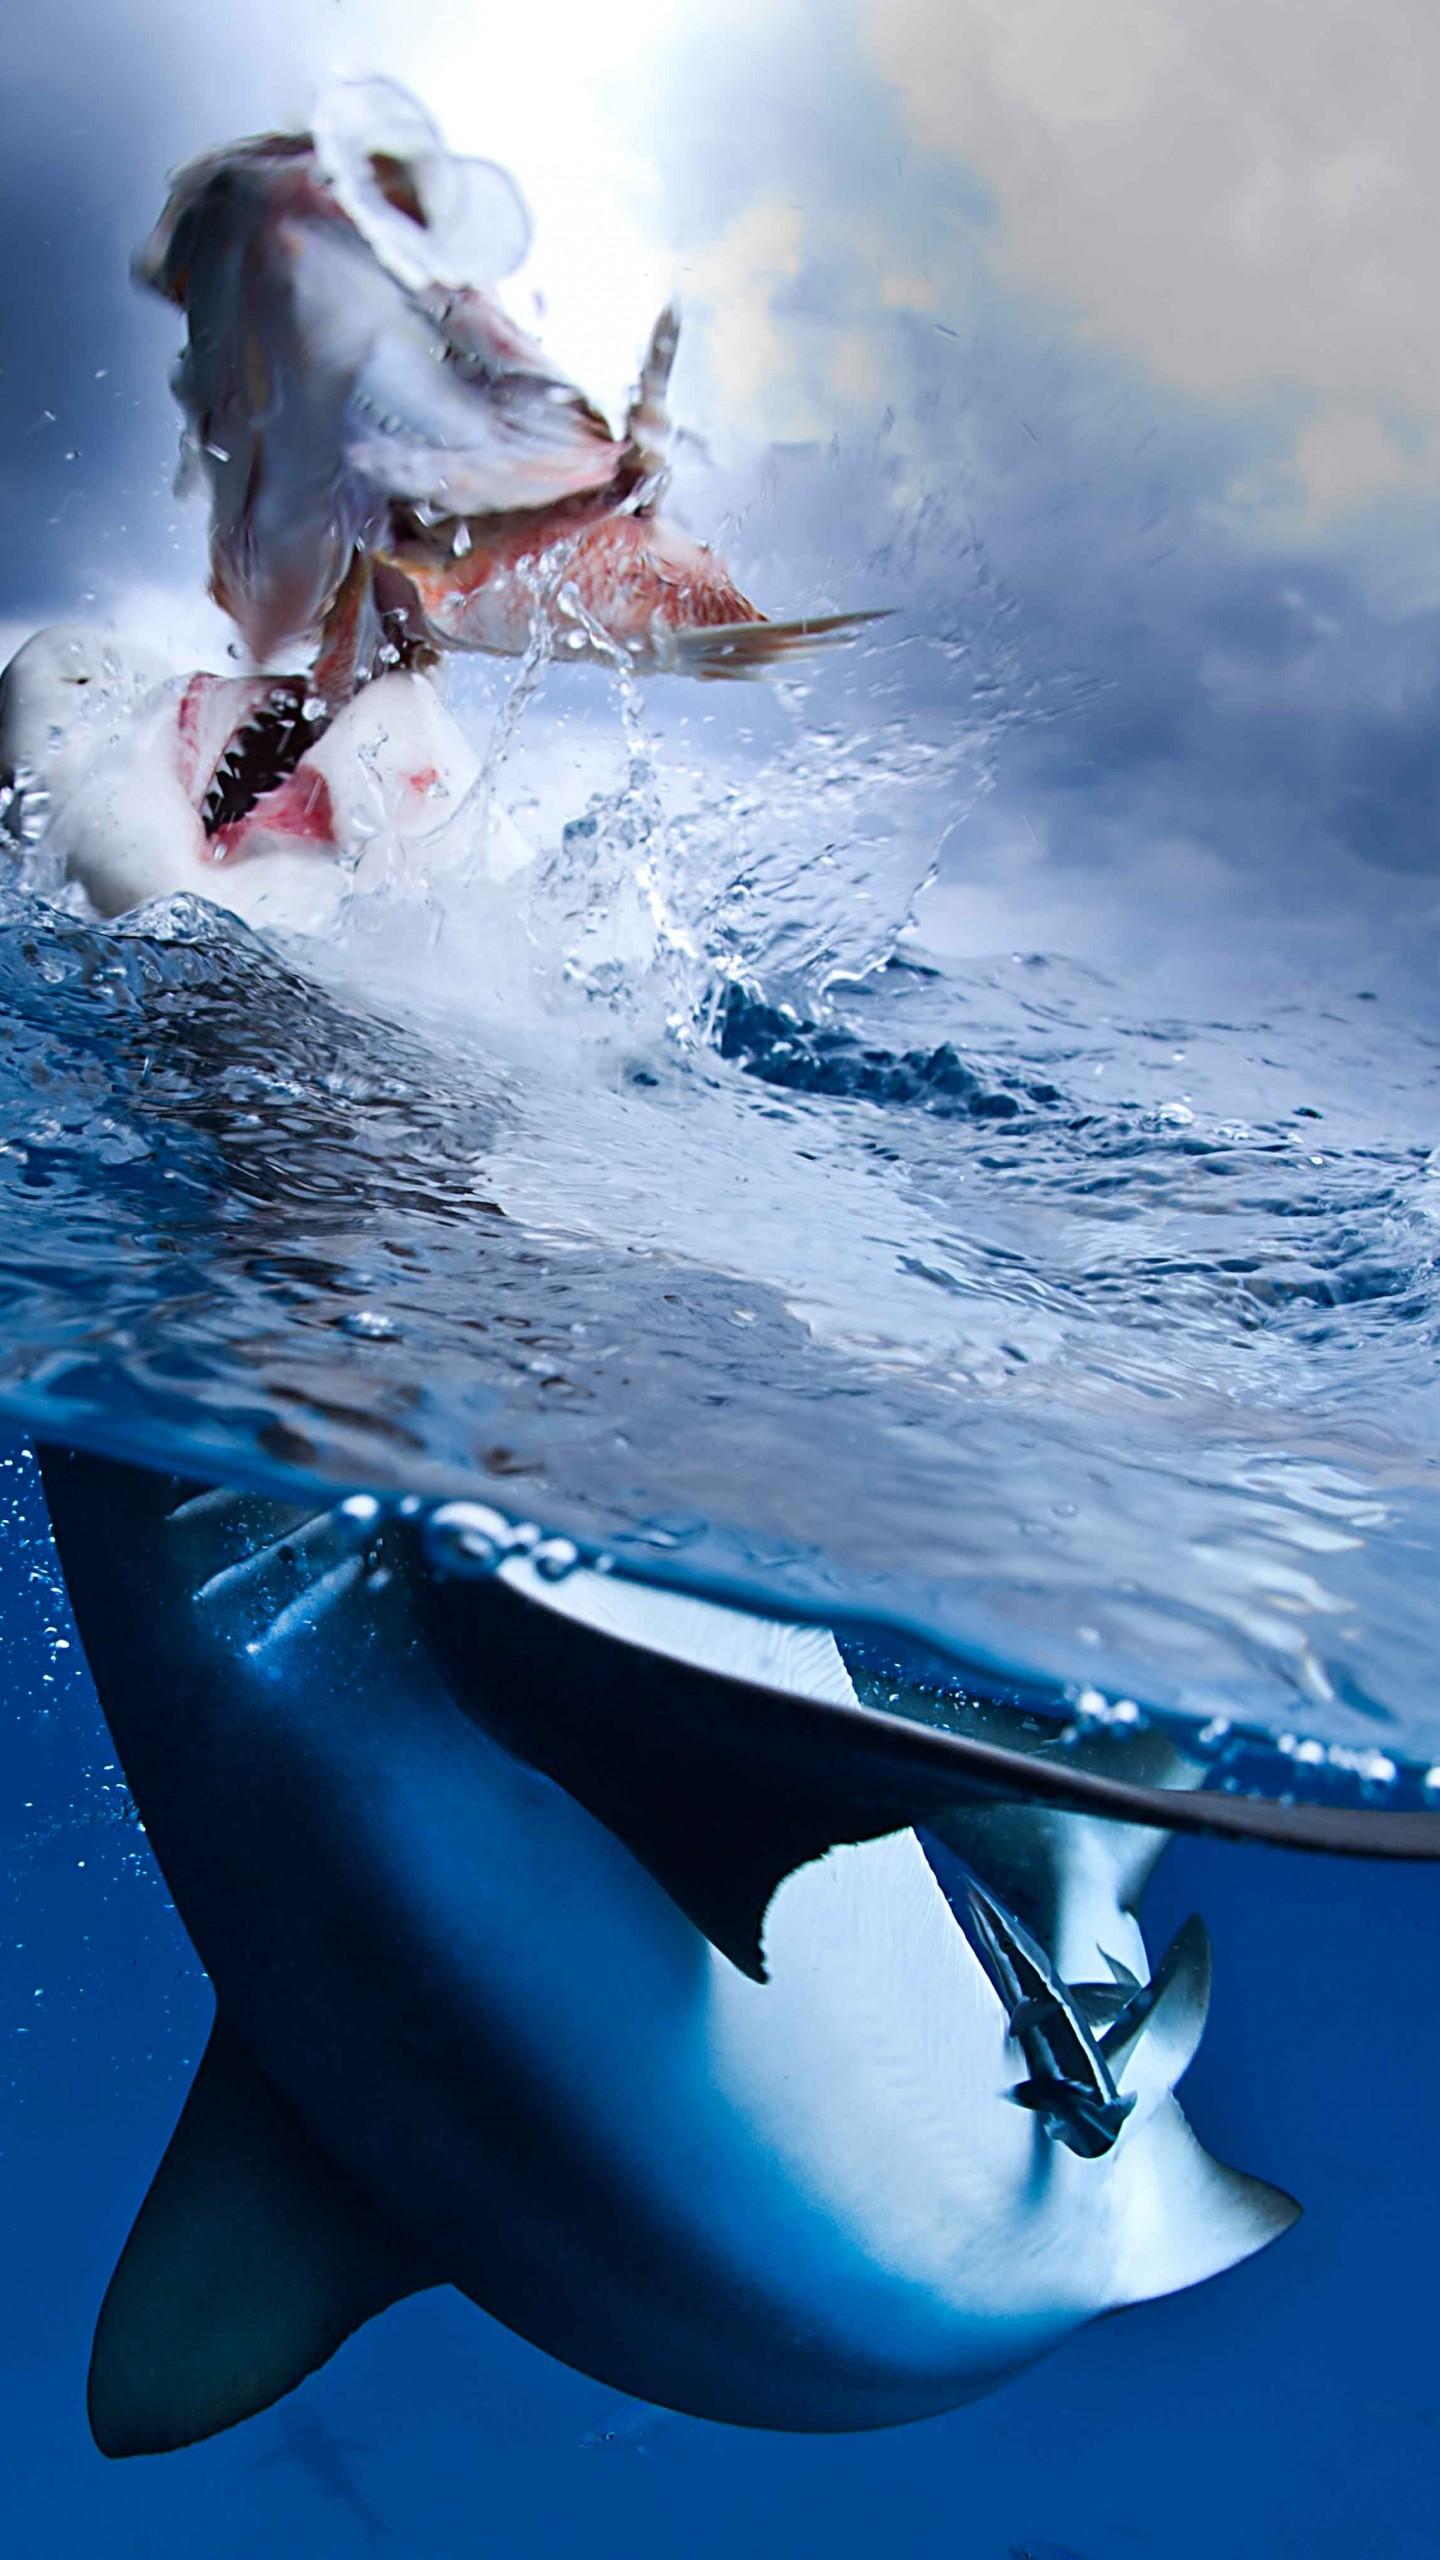 wallpaper caribbean reef  shark  diving  tourism  travel